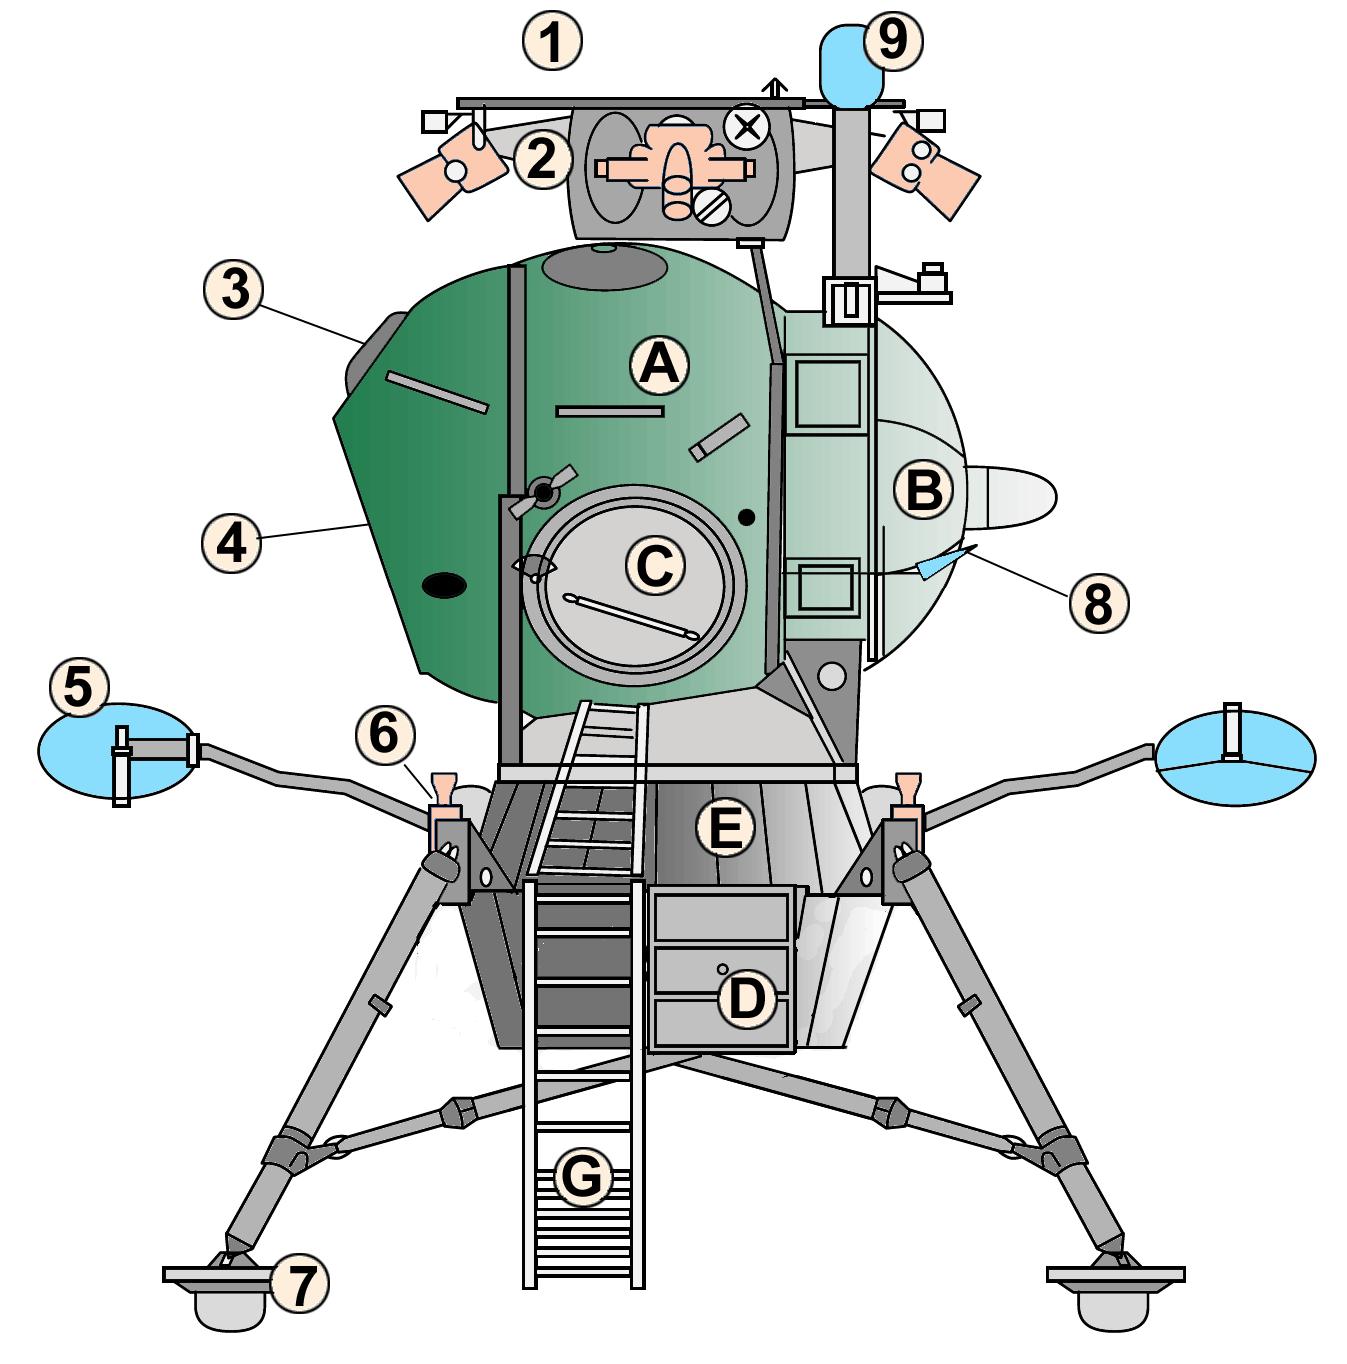 luna spacecraft drawings - photo #49